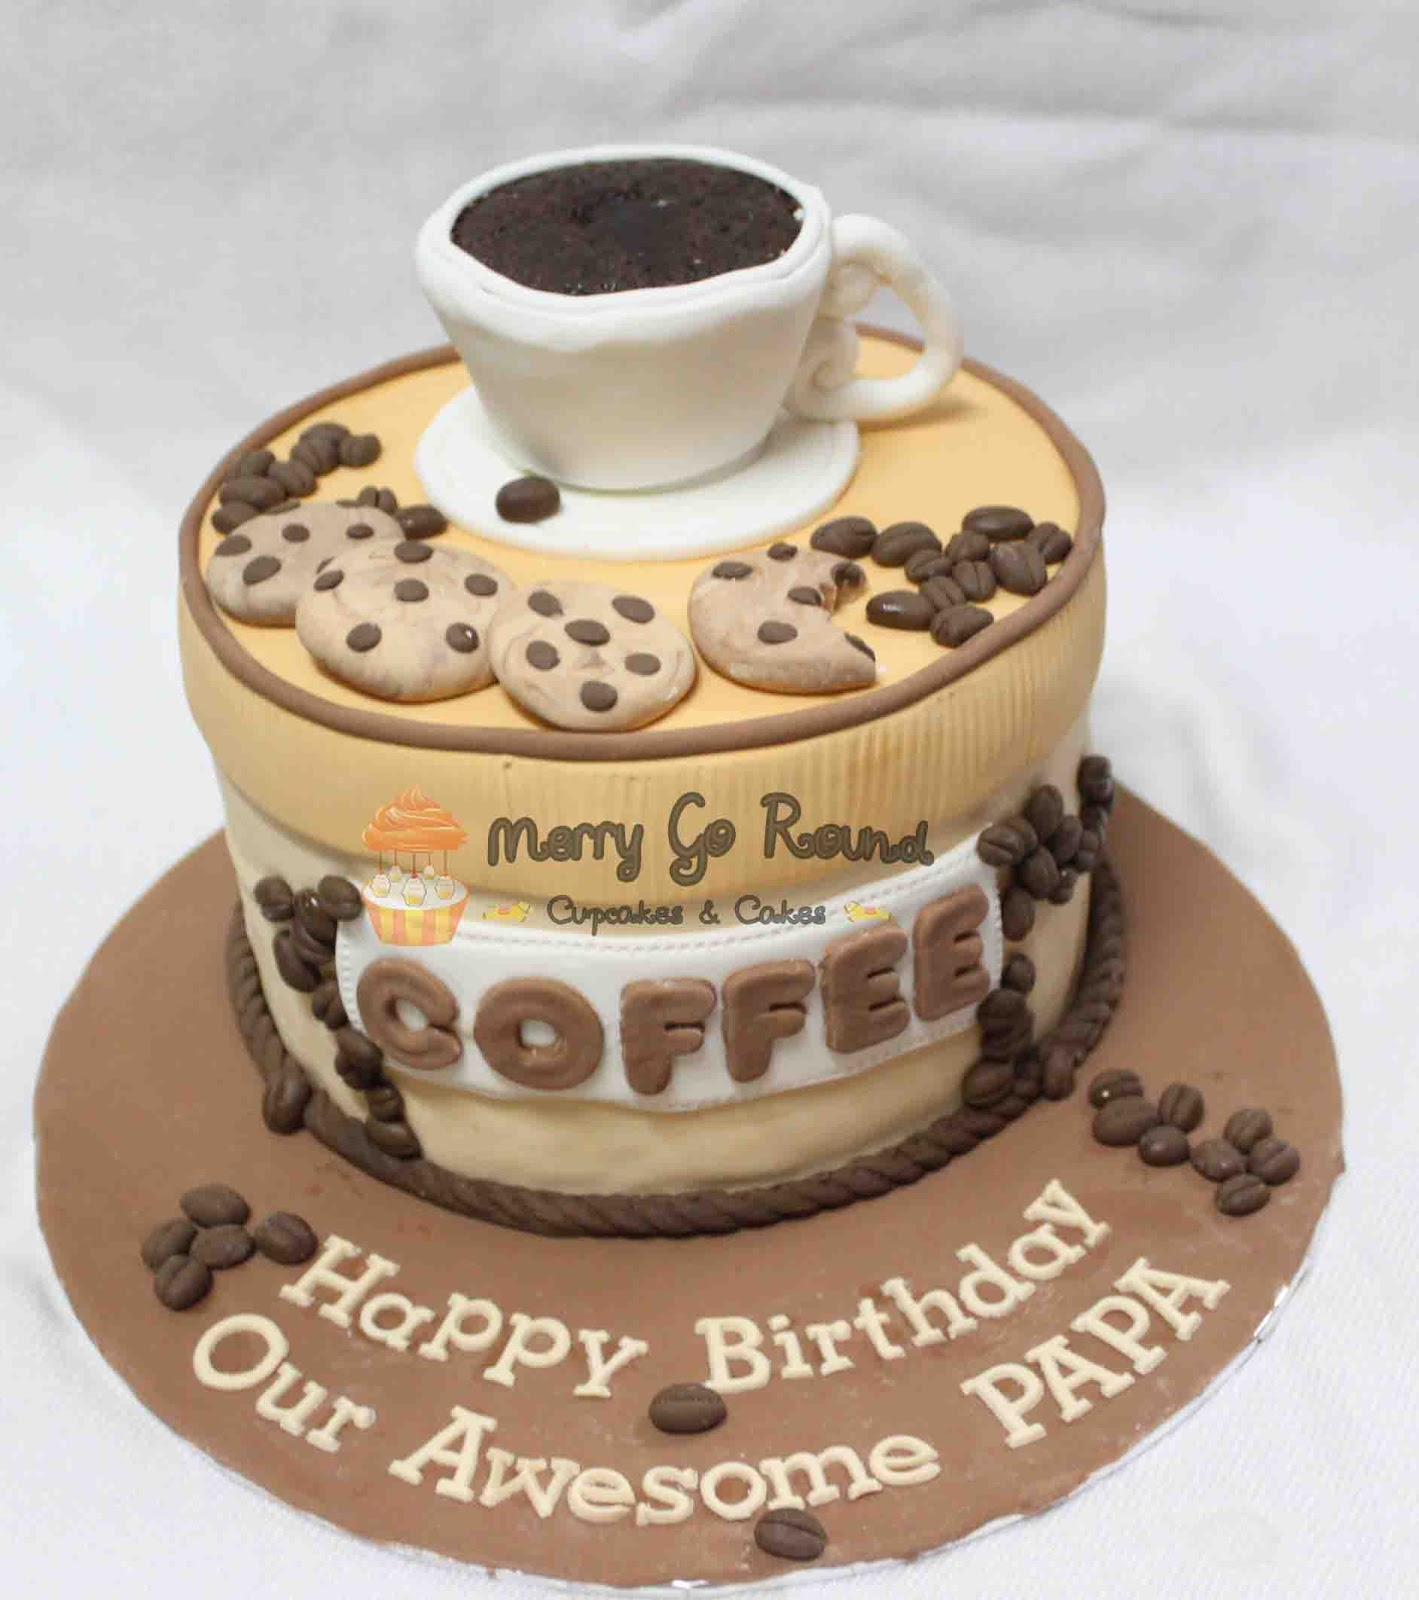 Merry Go Round Cupcakes Cakes Coffee Lovers Birthday Cake